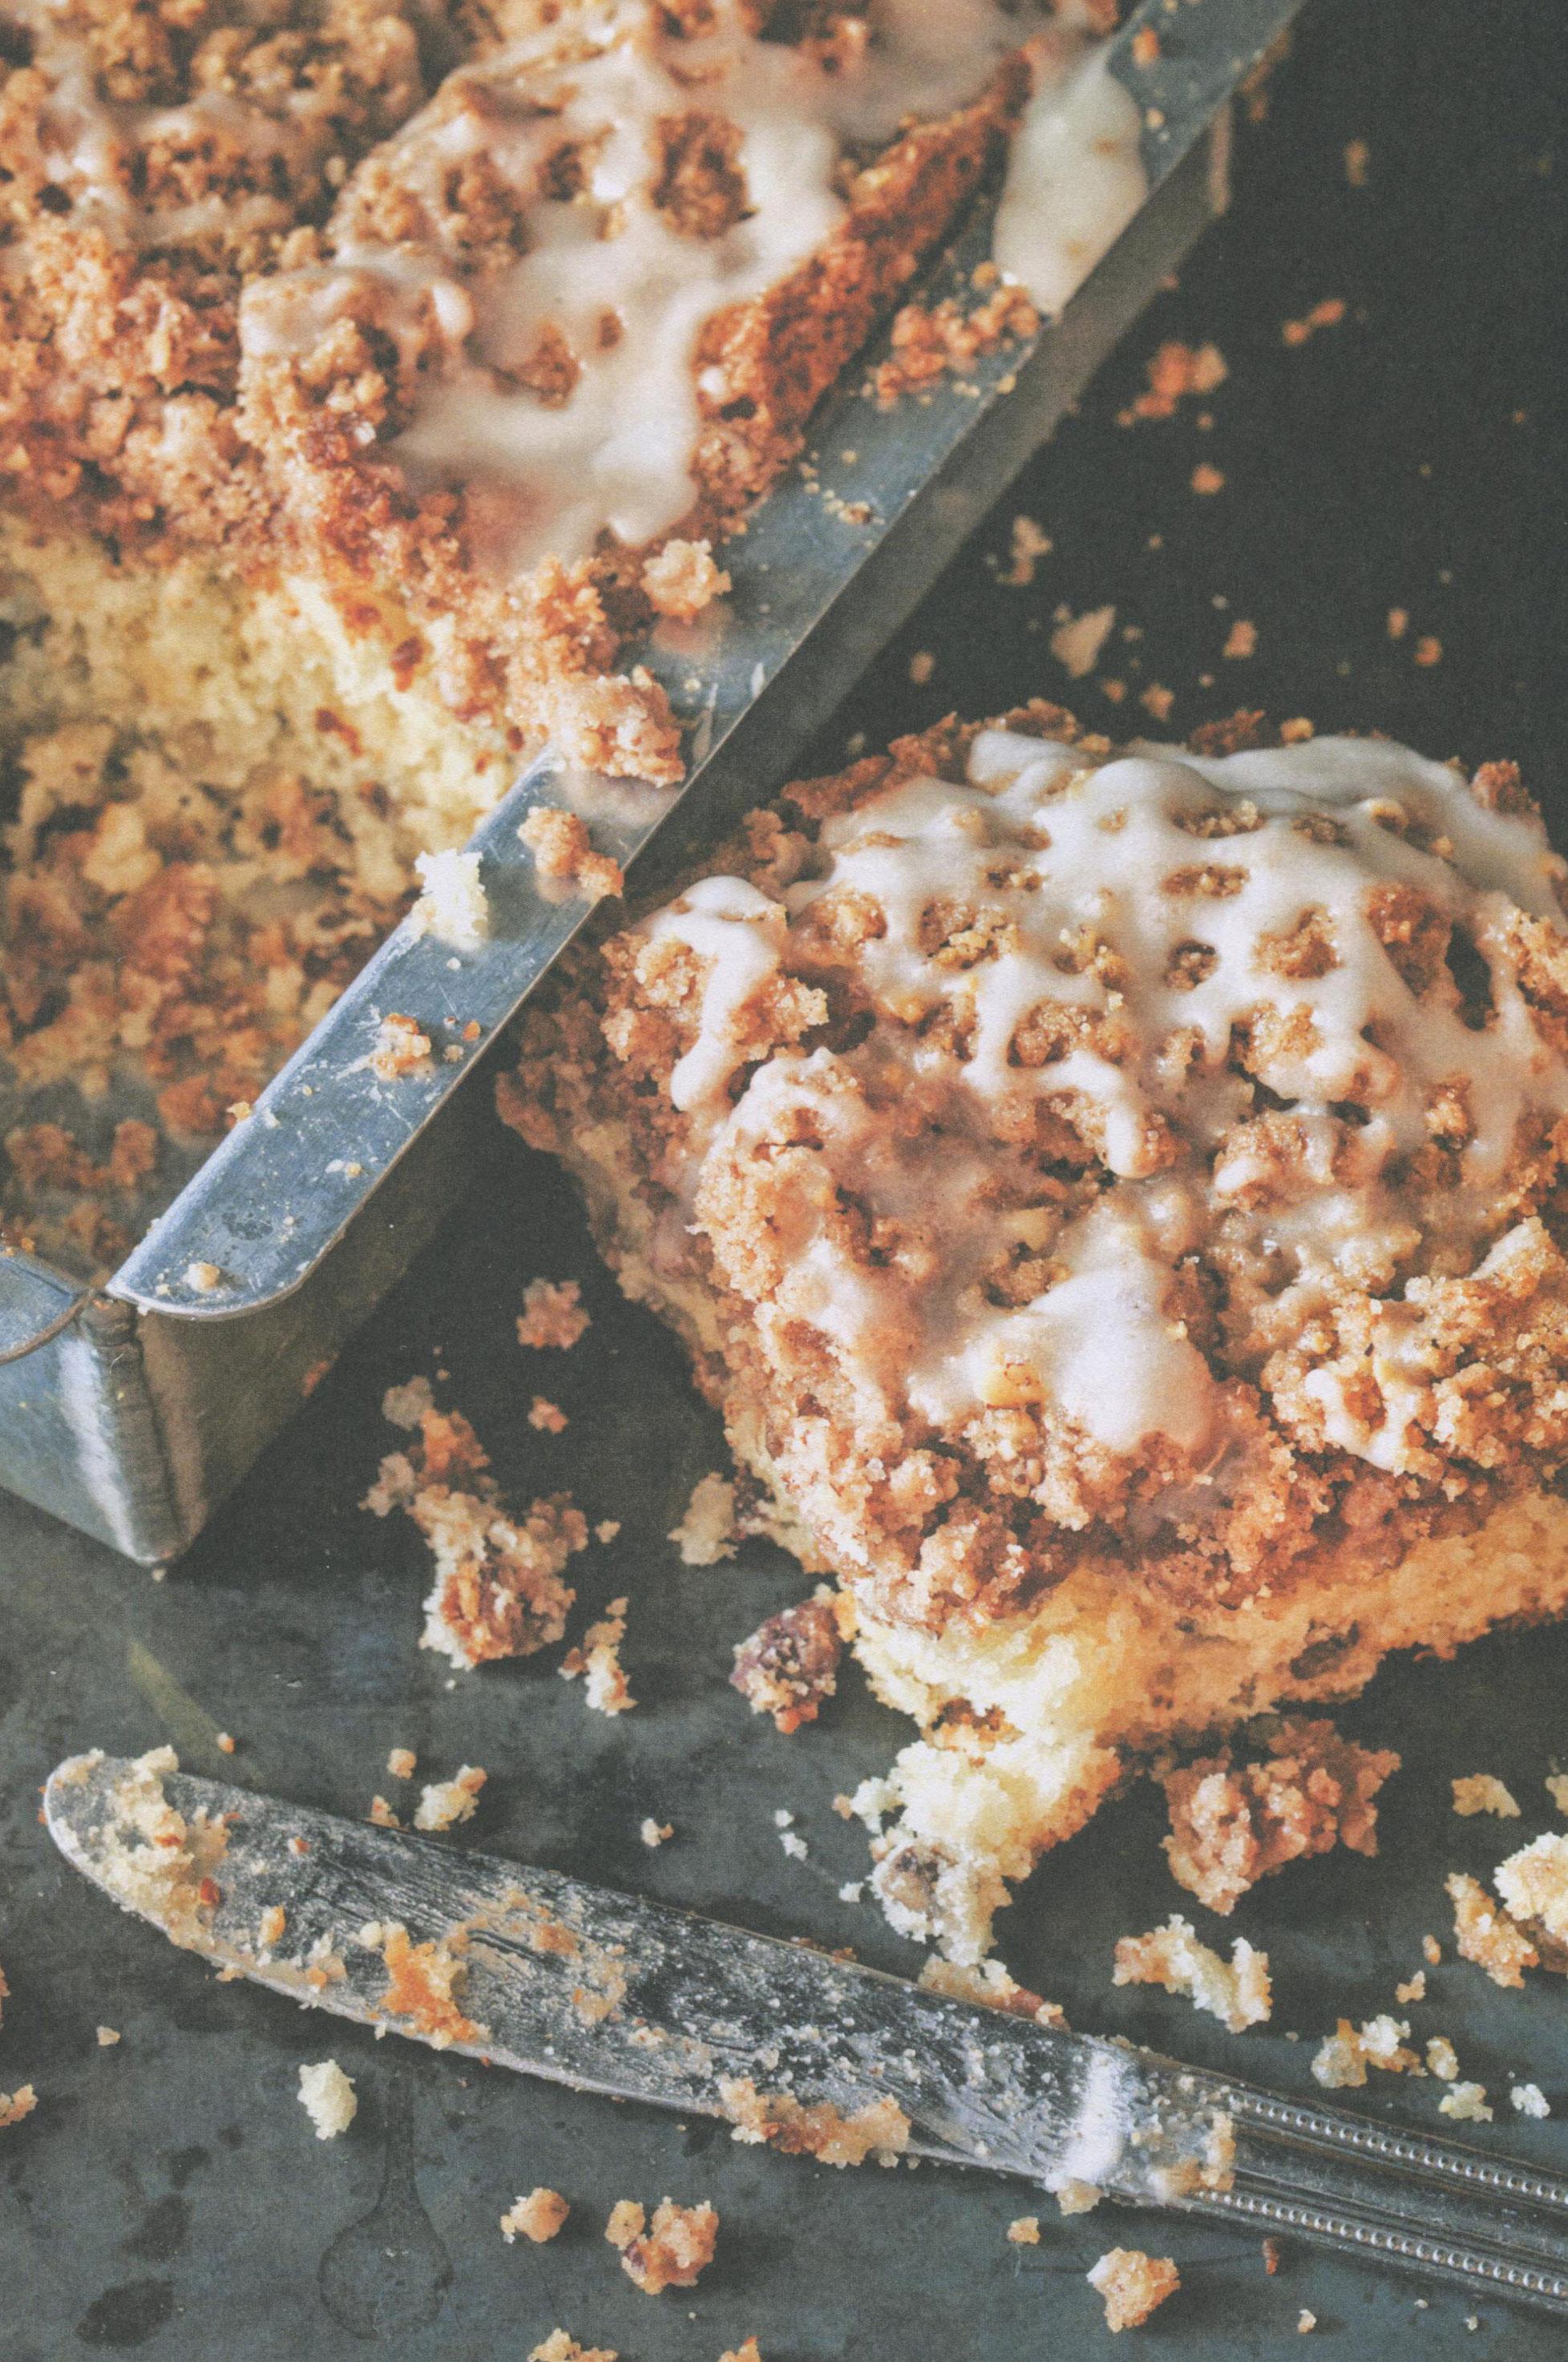 Banana Pecan Coffee Cake from Big Bad Breakfast